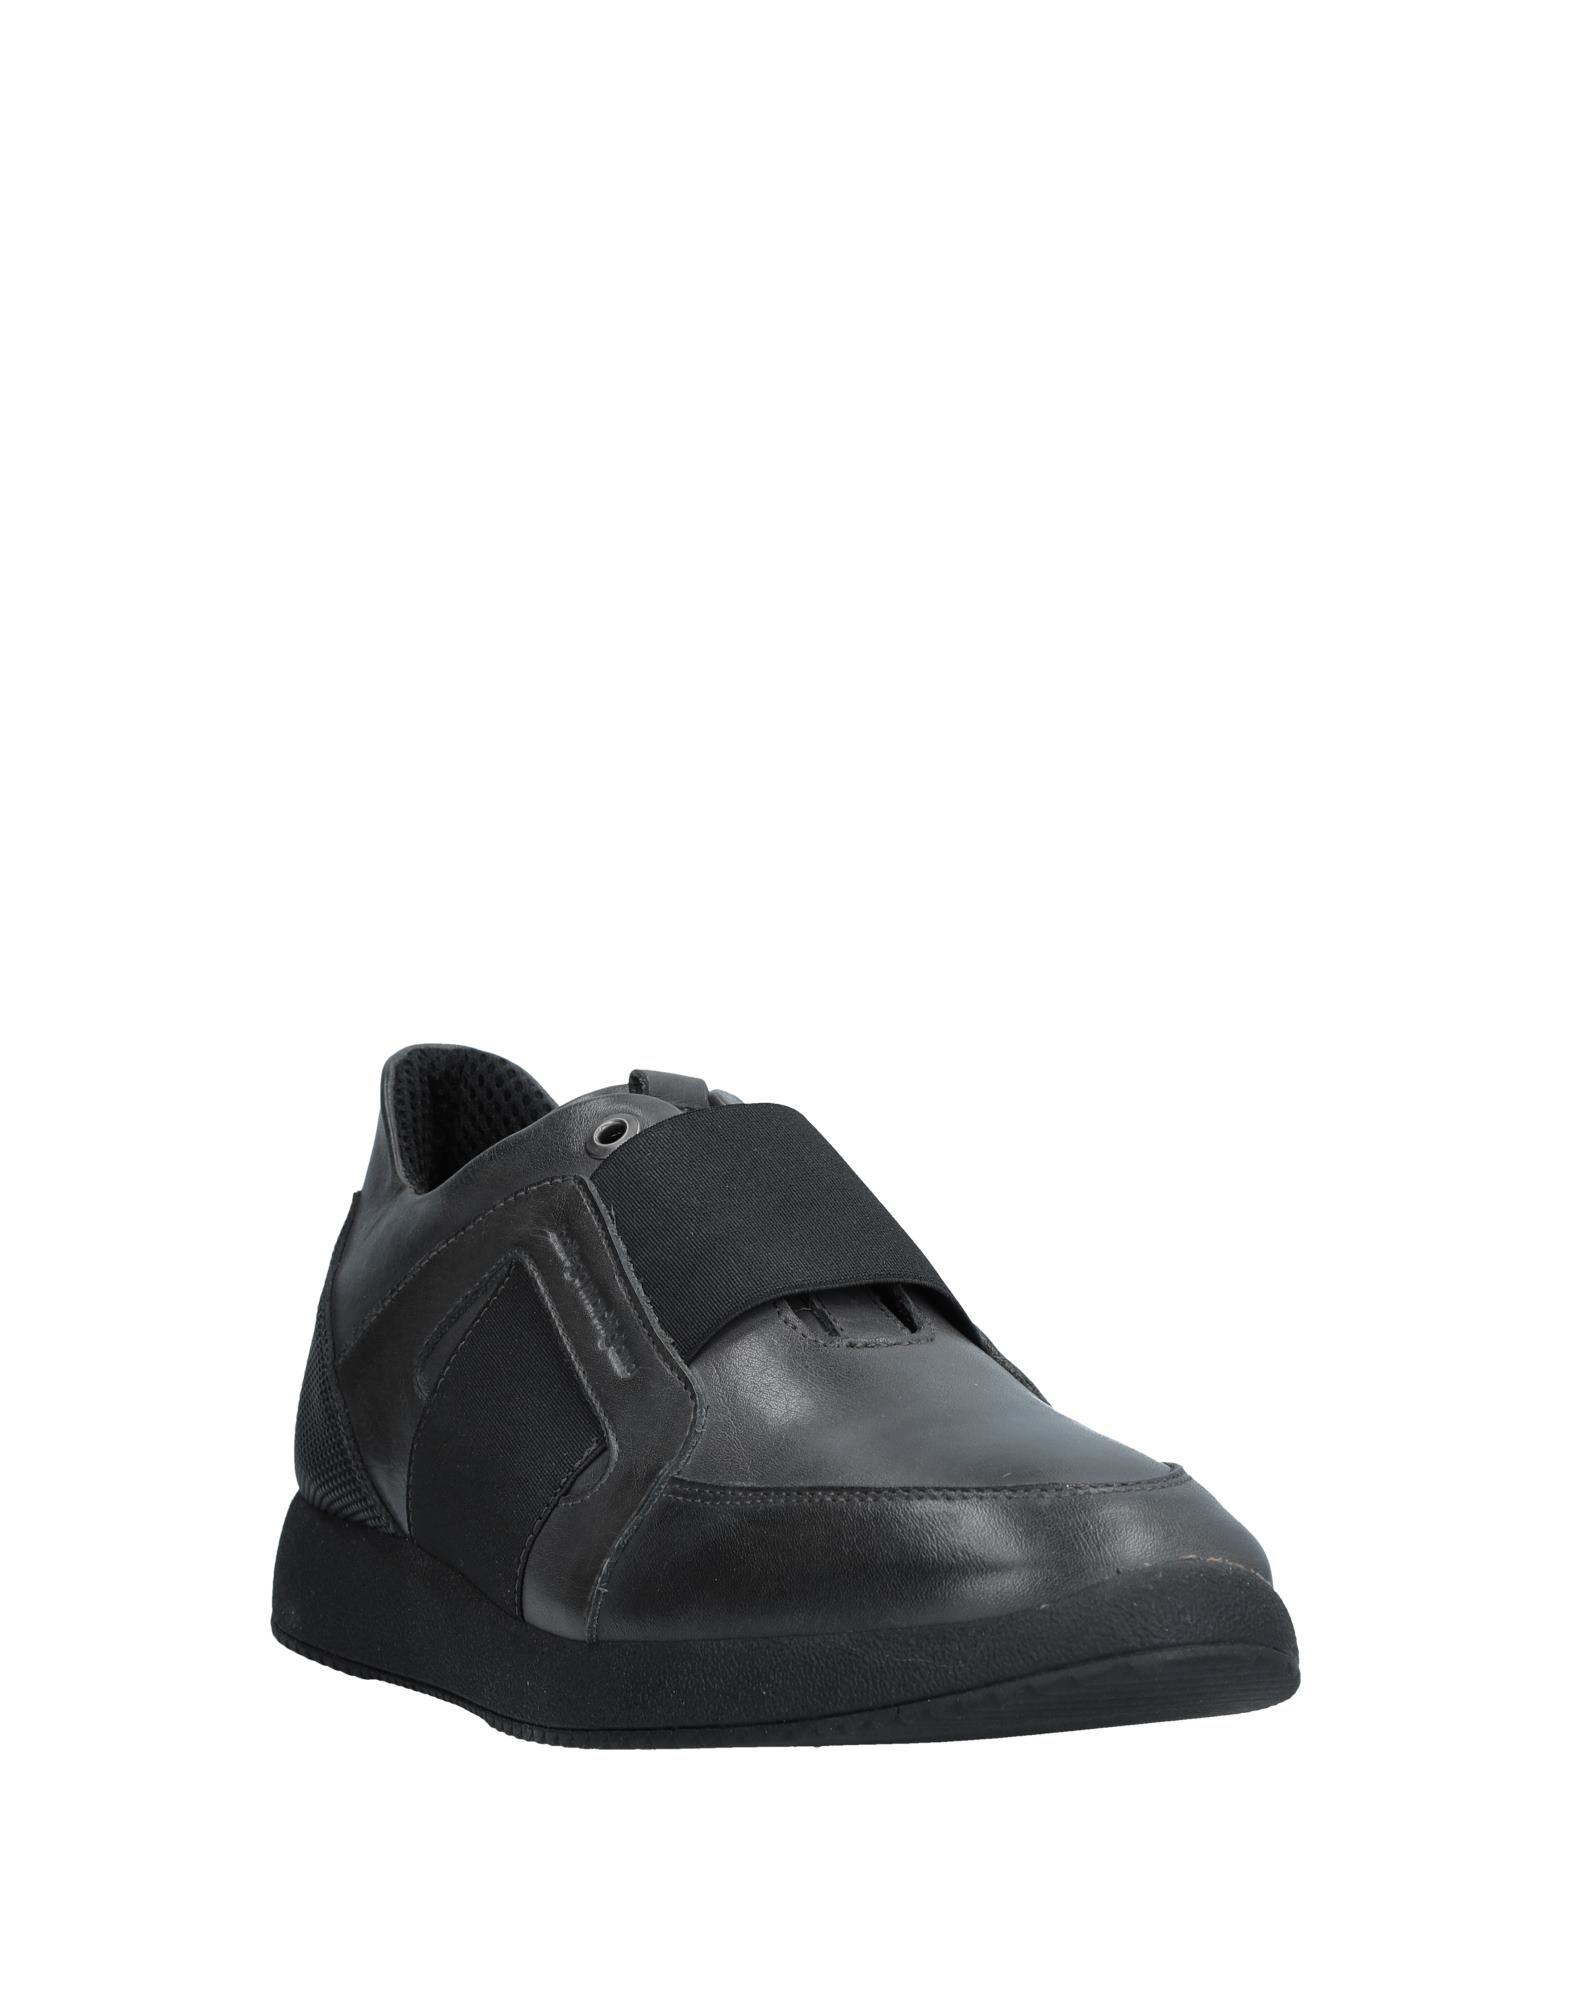 Bottega Marchigiana Sneakers Herren  11541839QJ Gute Qualität beliebte Schuhe